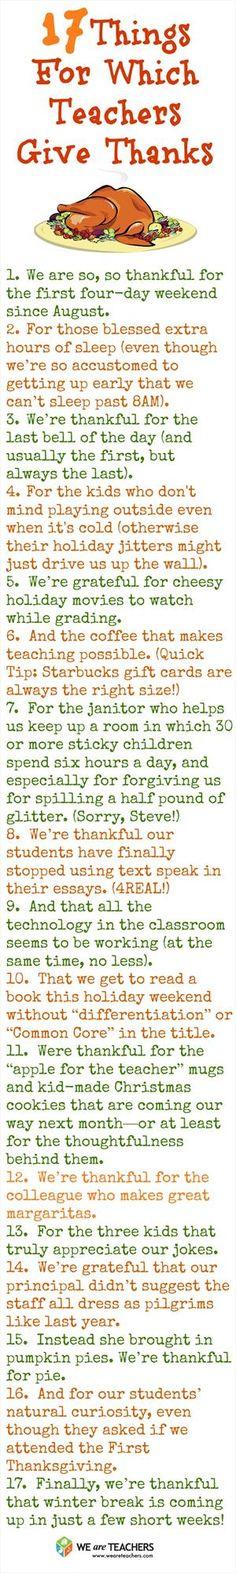 Reasons teachers are thankful! #weareteachers @Wendy Felts Chiabotta-Cieslak @Melanie Bauer Anderson